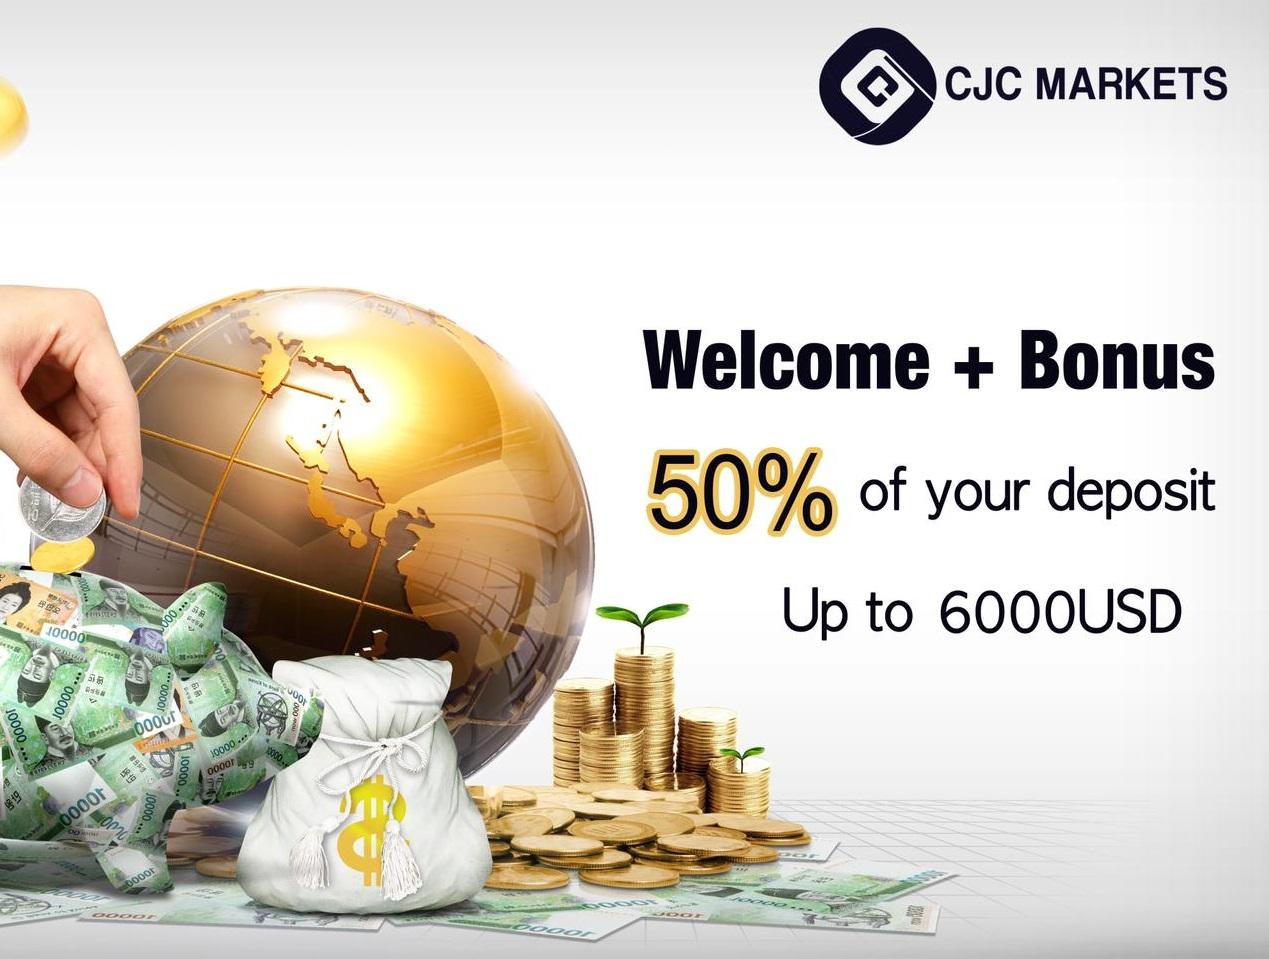 Bonus Deposit CJC Markets 50%